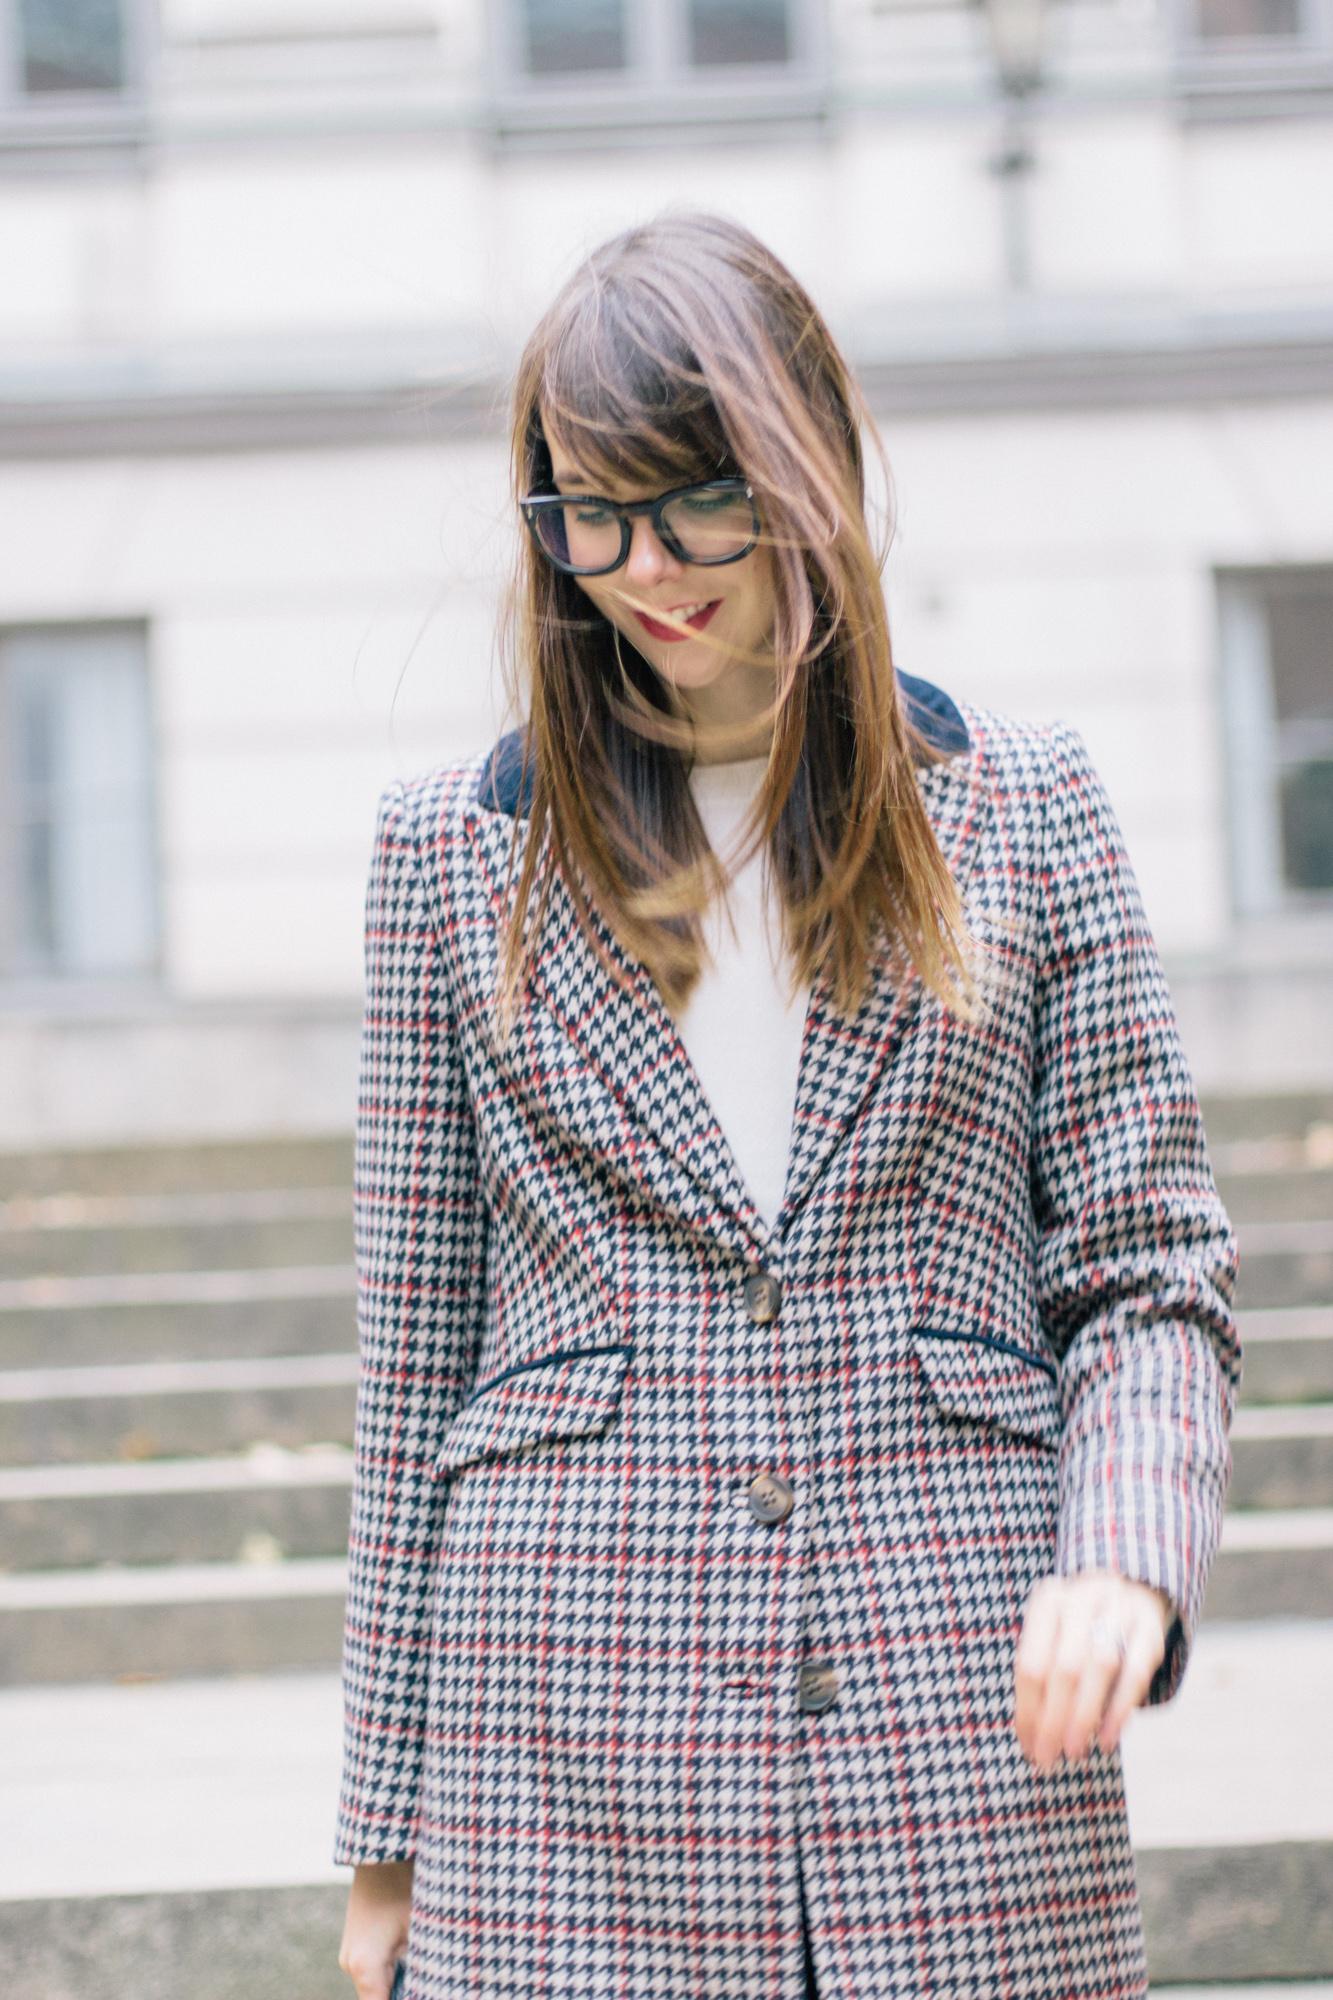 Look 2: SMart City Dressing -